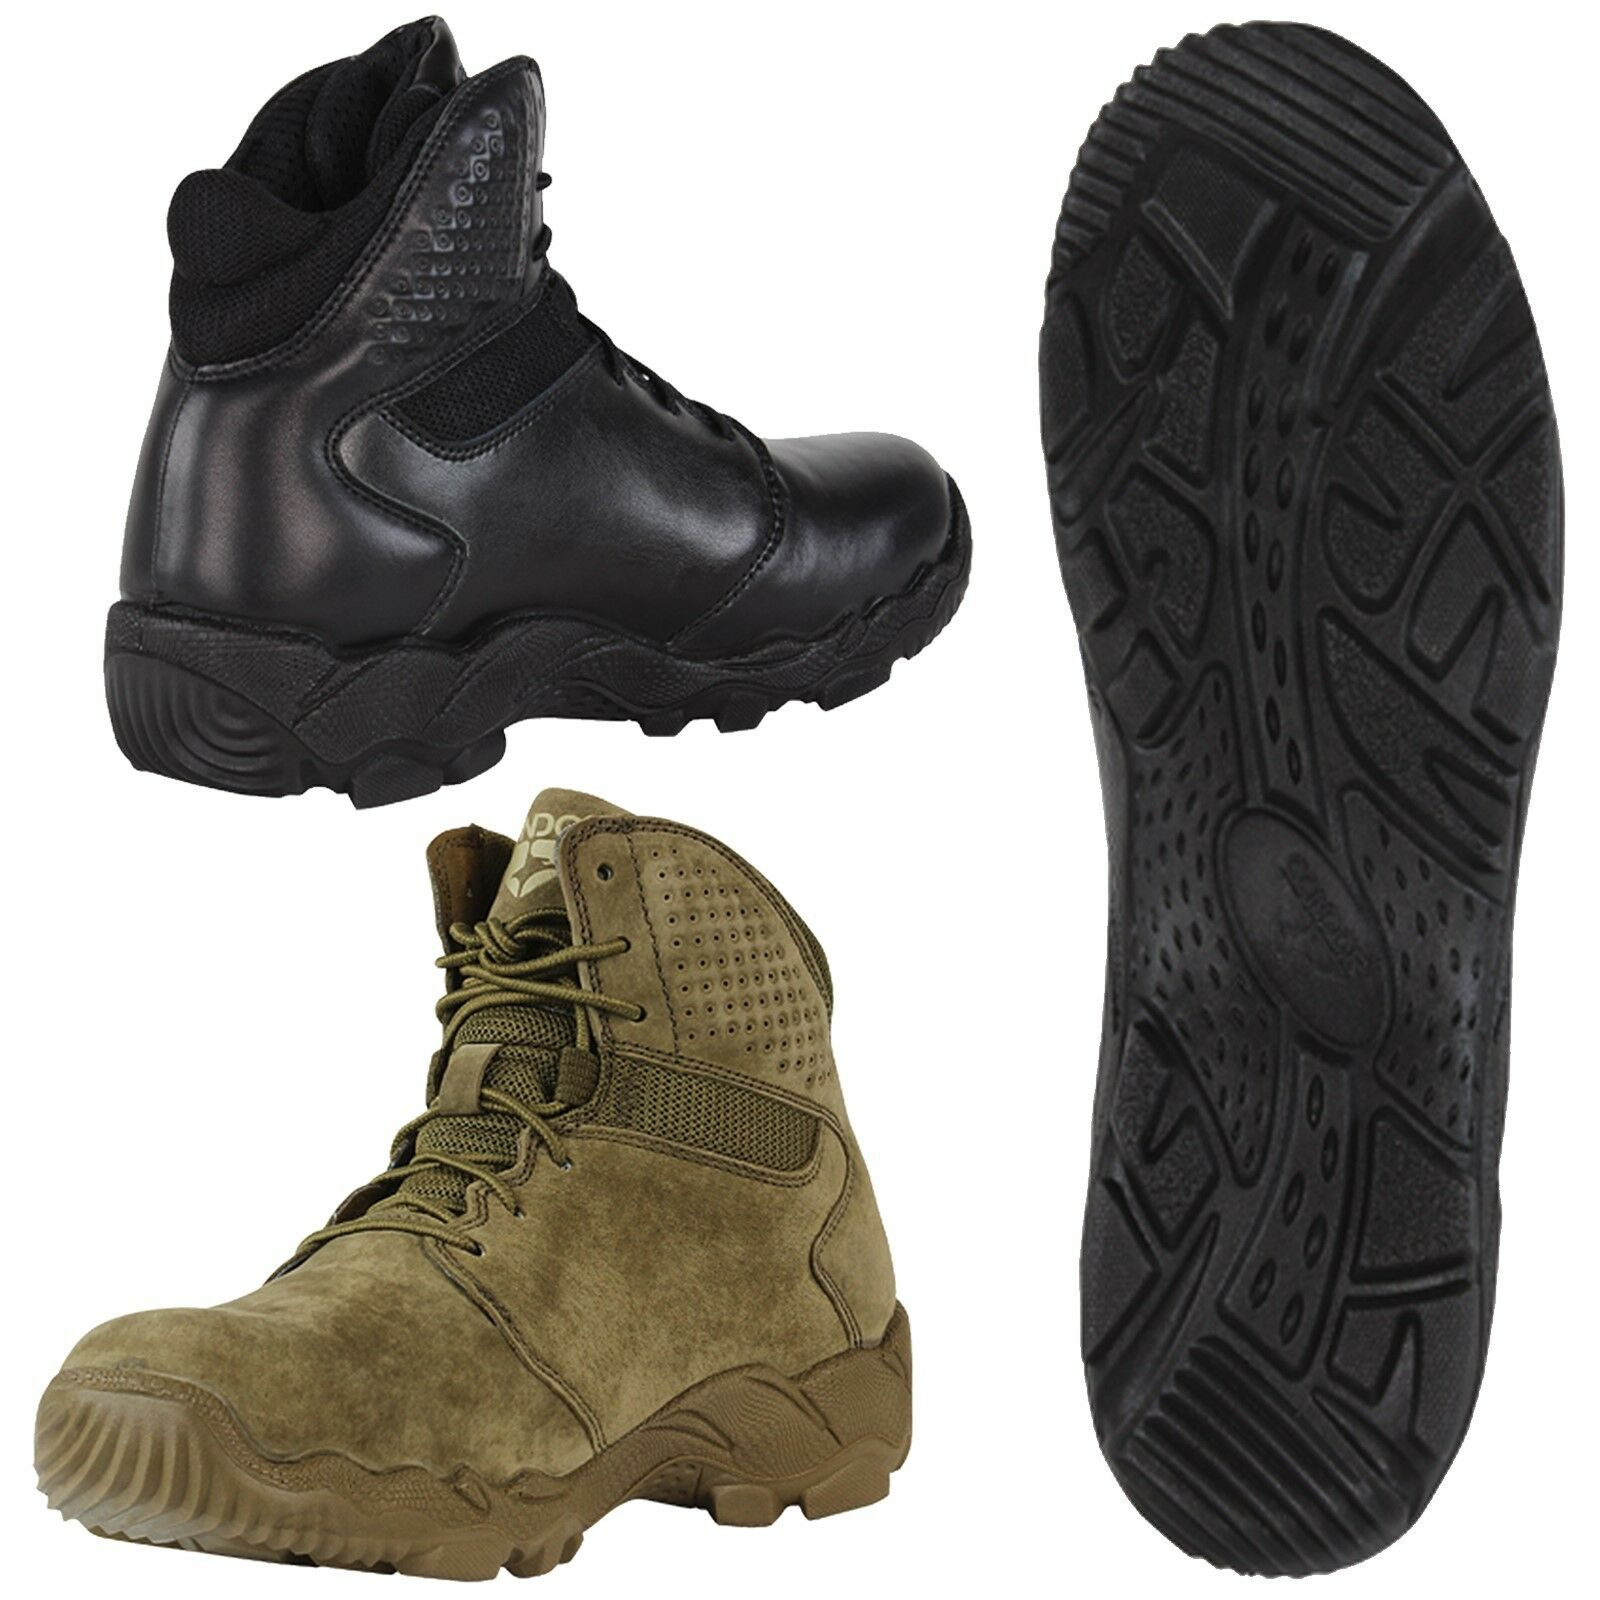 Condor 235001 Tactical Hiking Working Keaton Leather Waterproof Combat Boots